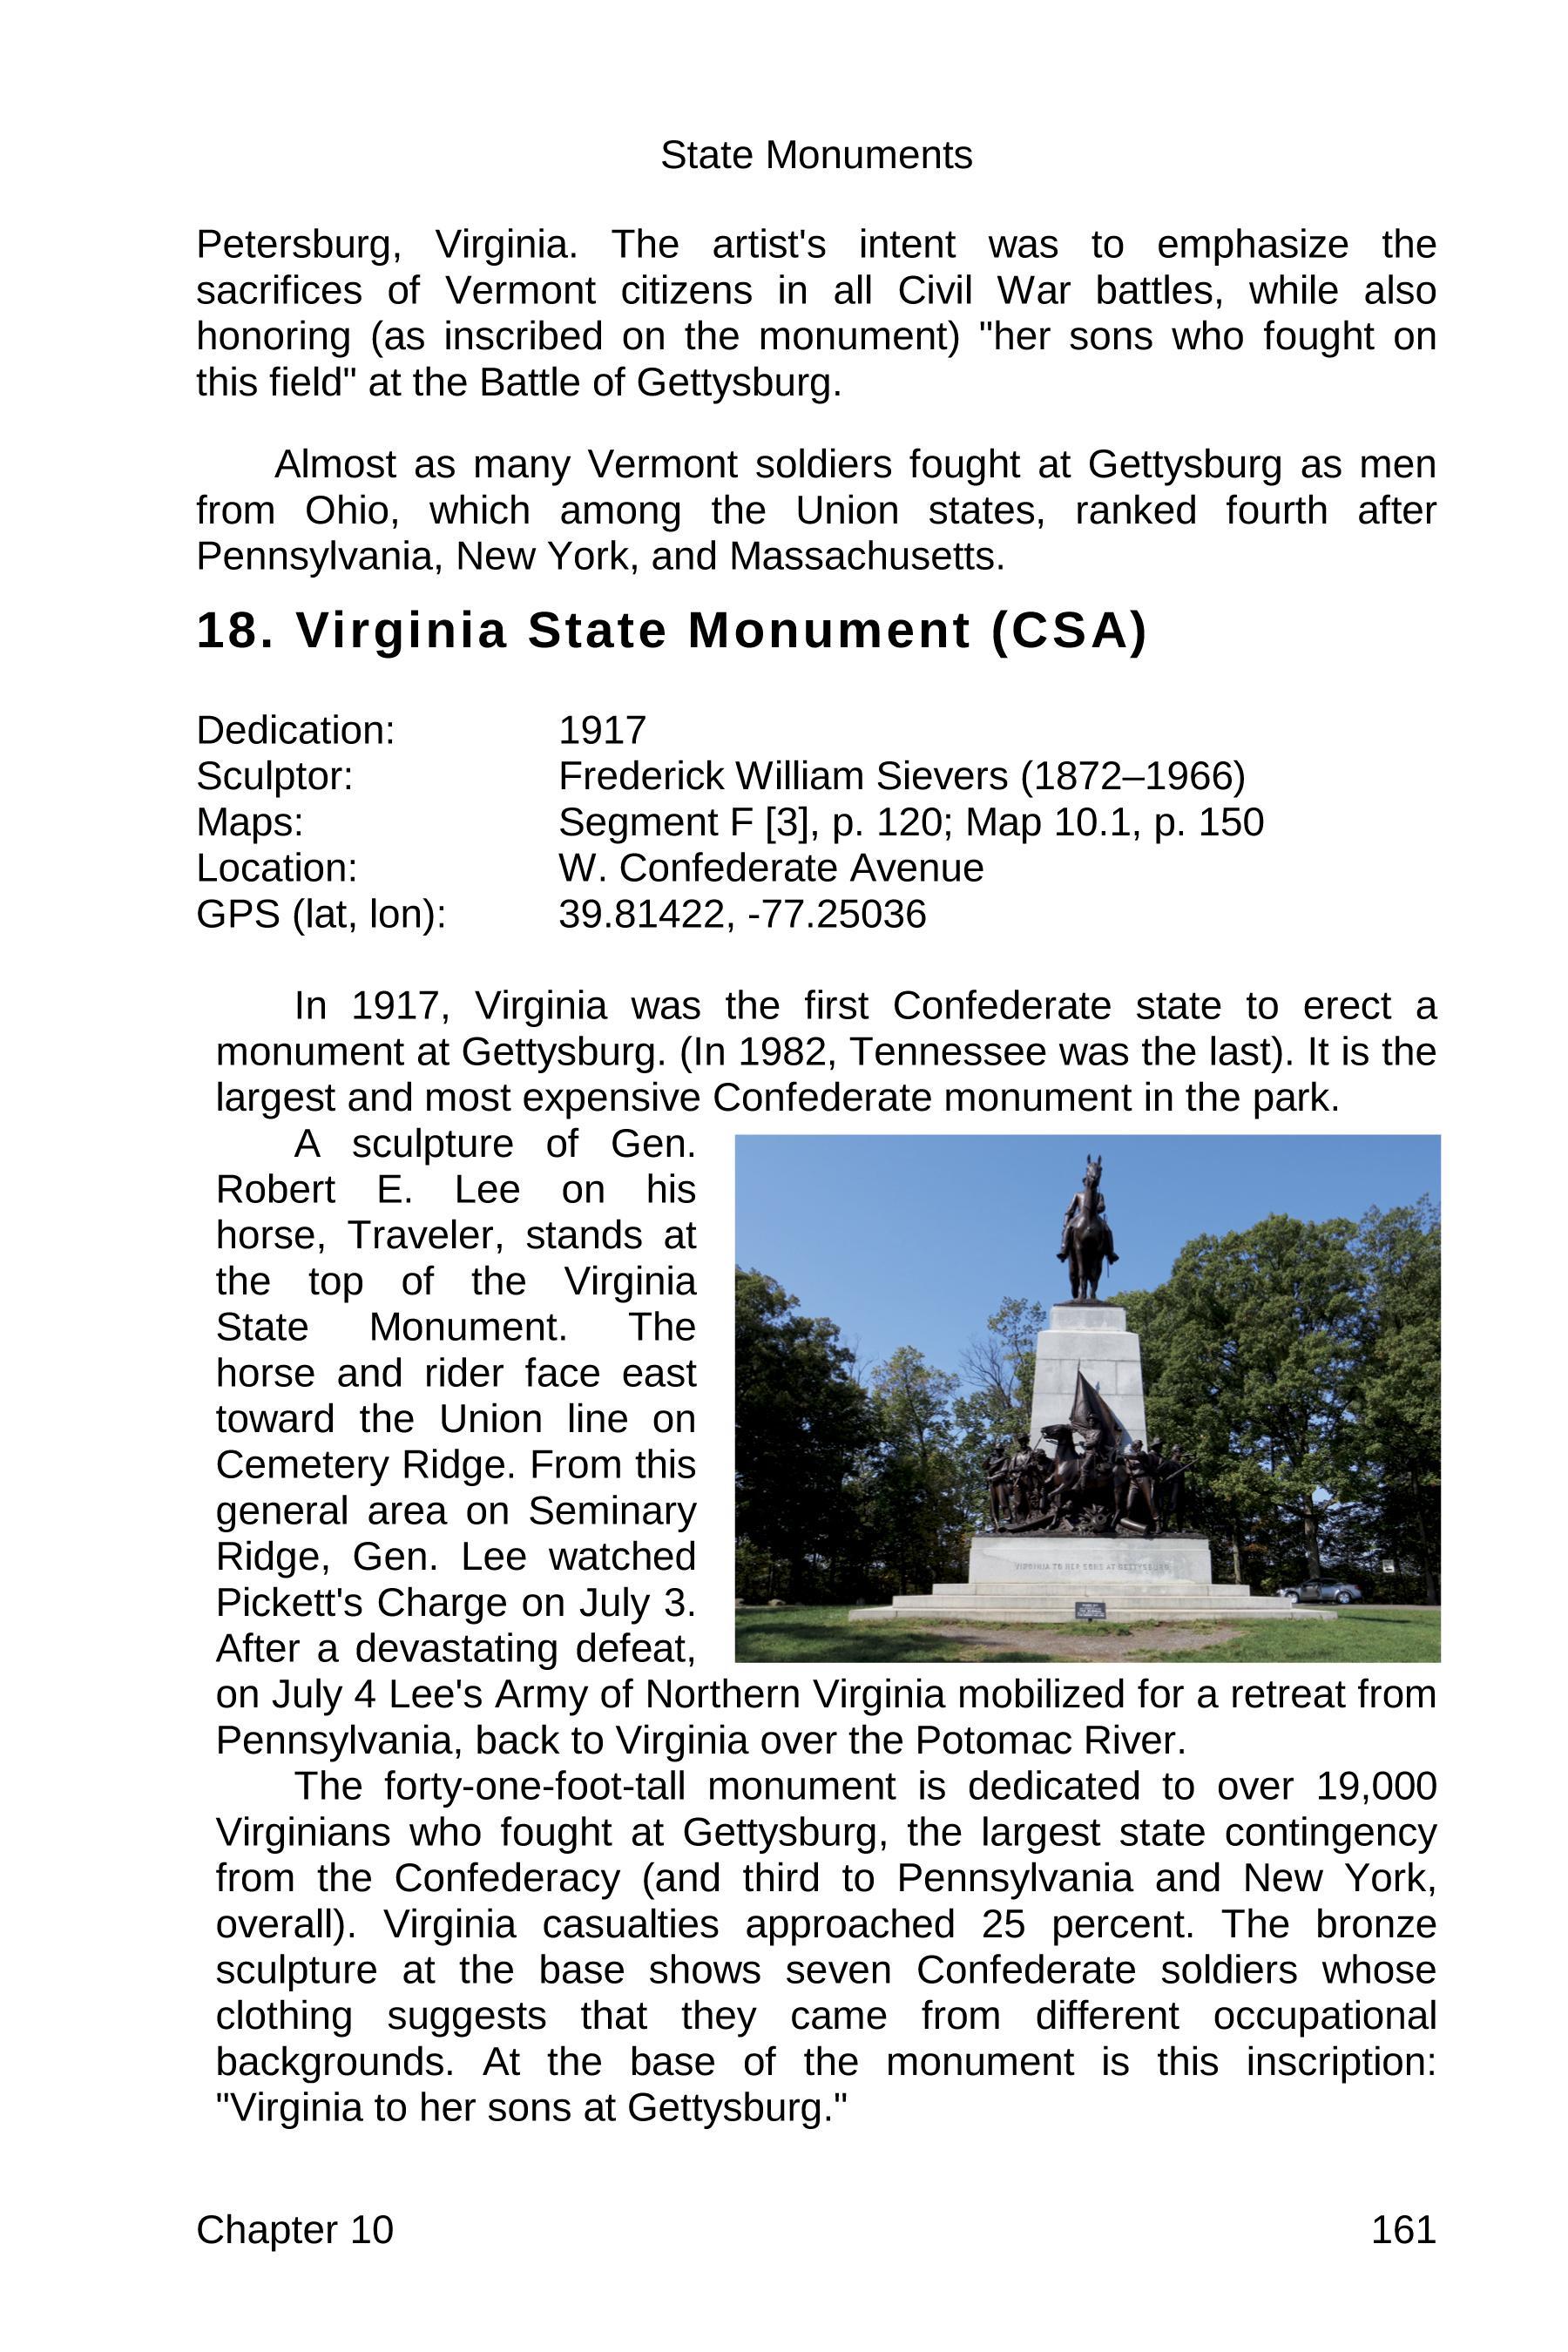 gettysburg state monuments sample 161